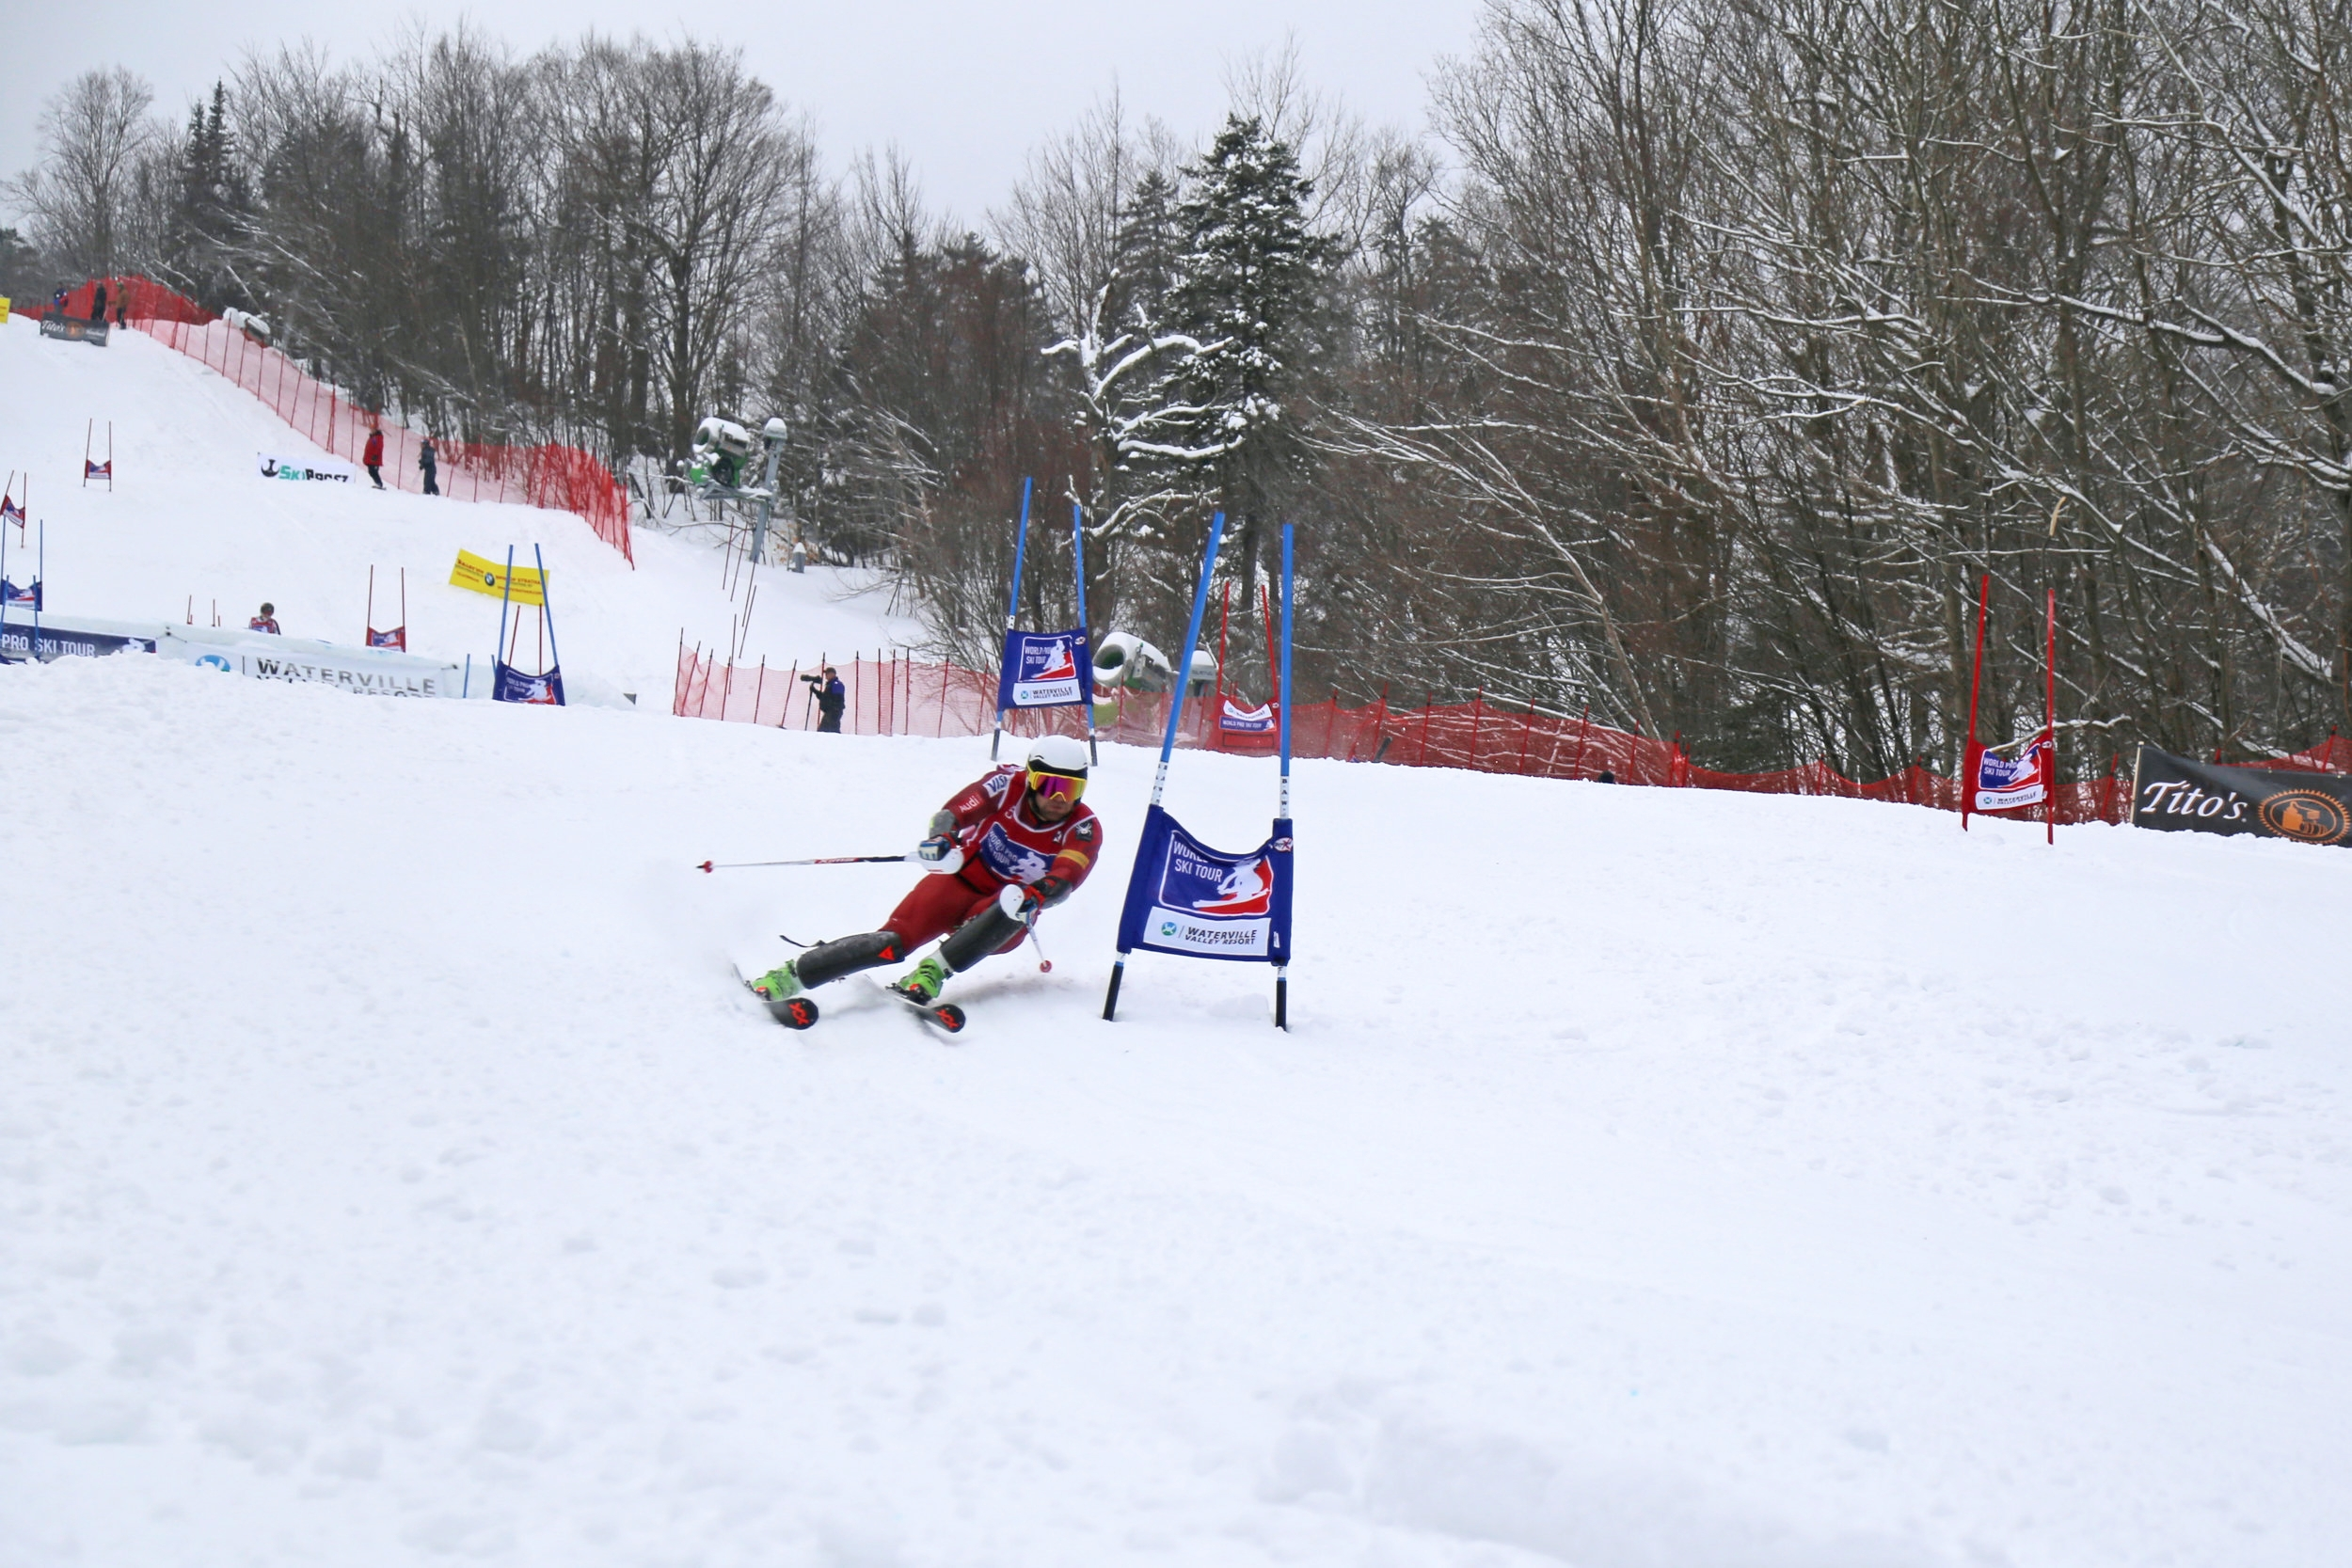 2018 U.S. Ski Team Member, Nolan Kasper, races on Tommy's World Cup at Waterville Valley Resort